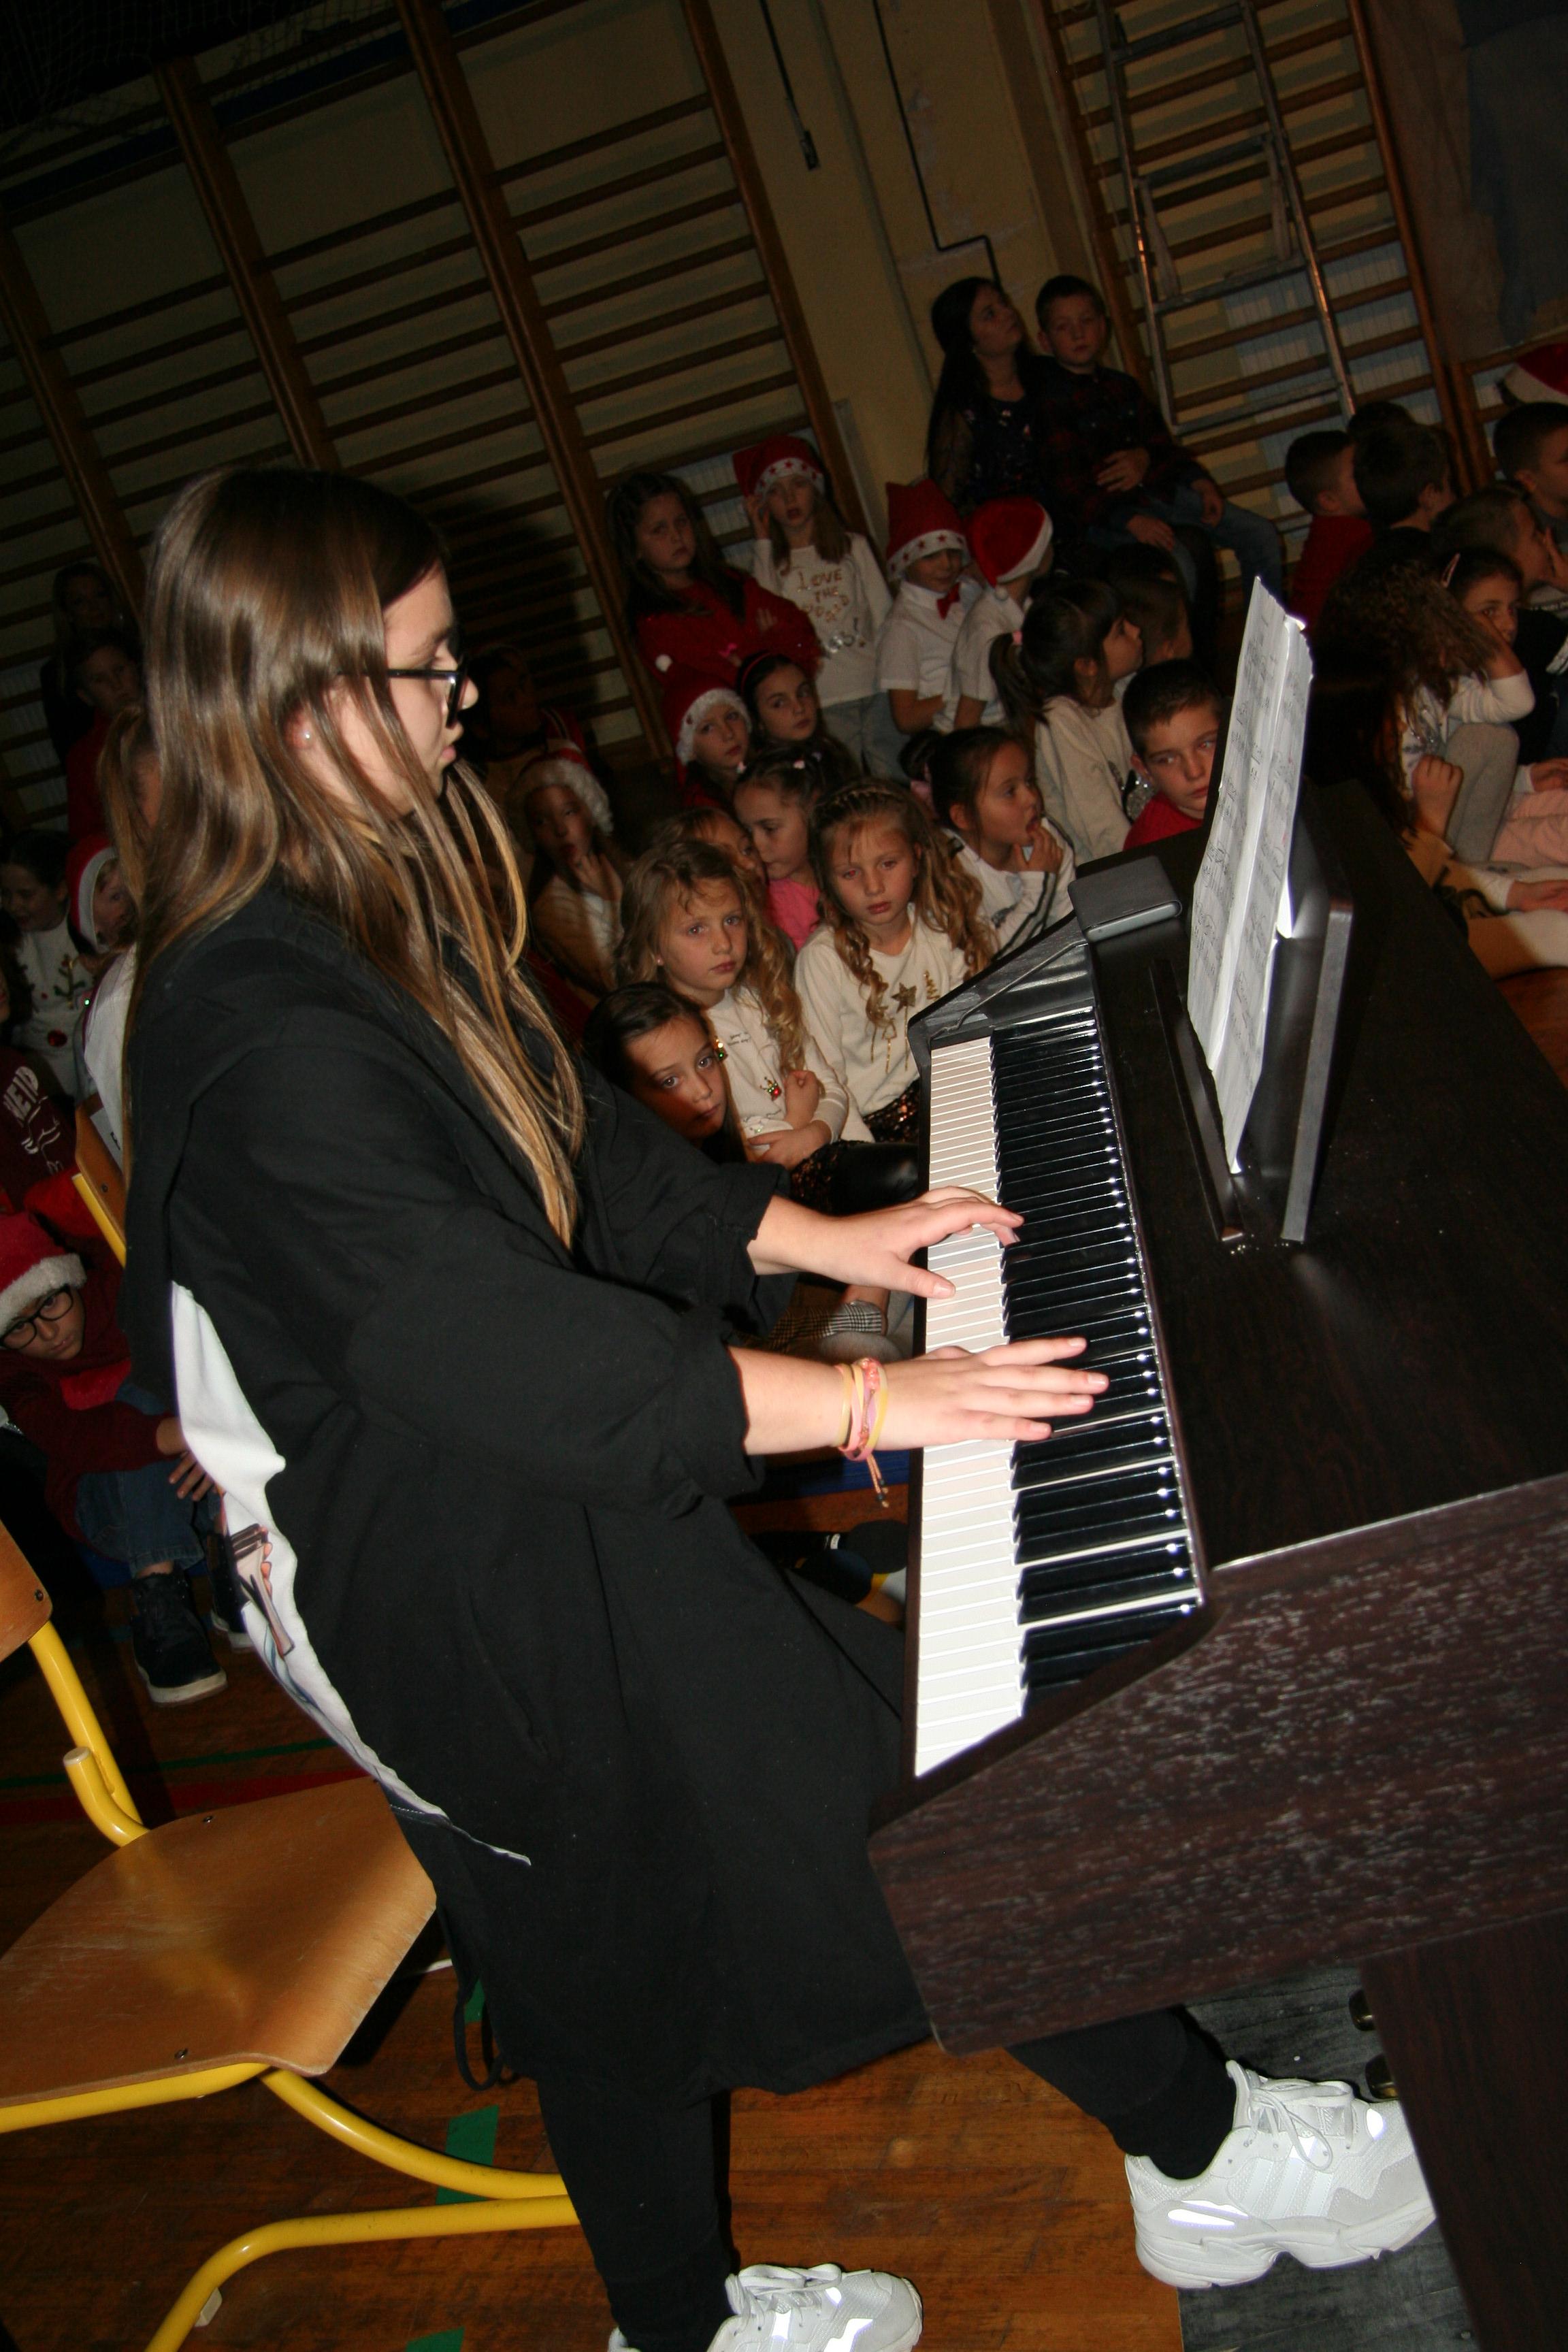 novoletno_humanitarni-koncert-2019-141